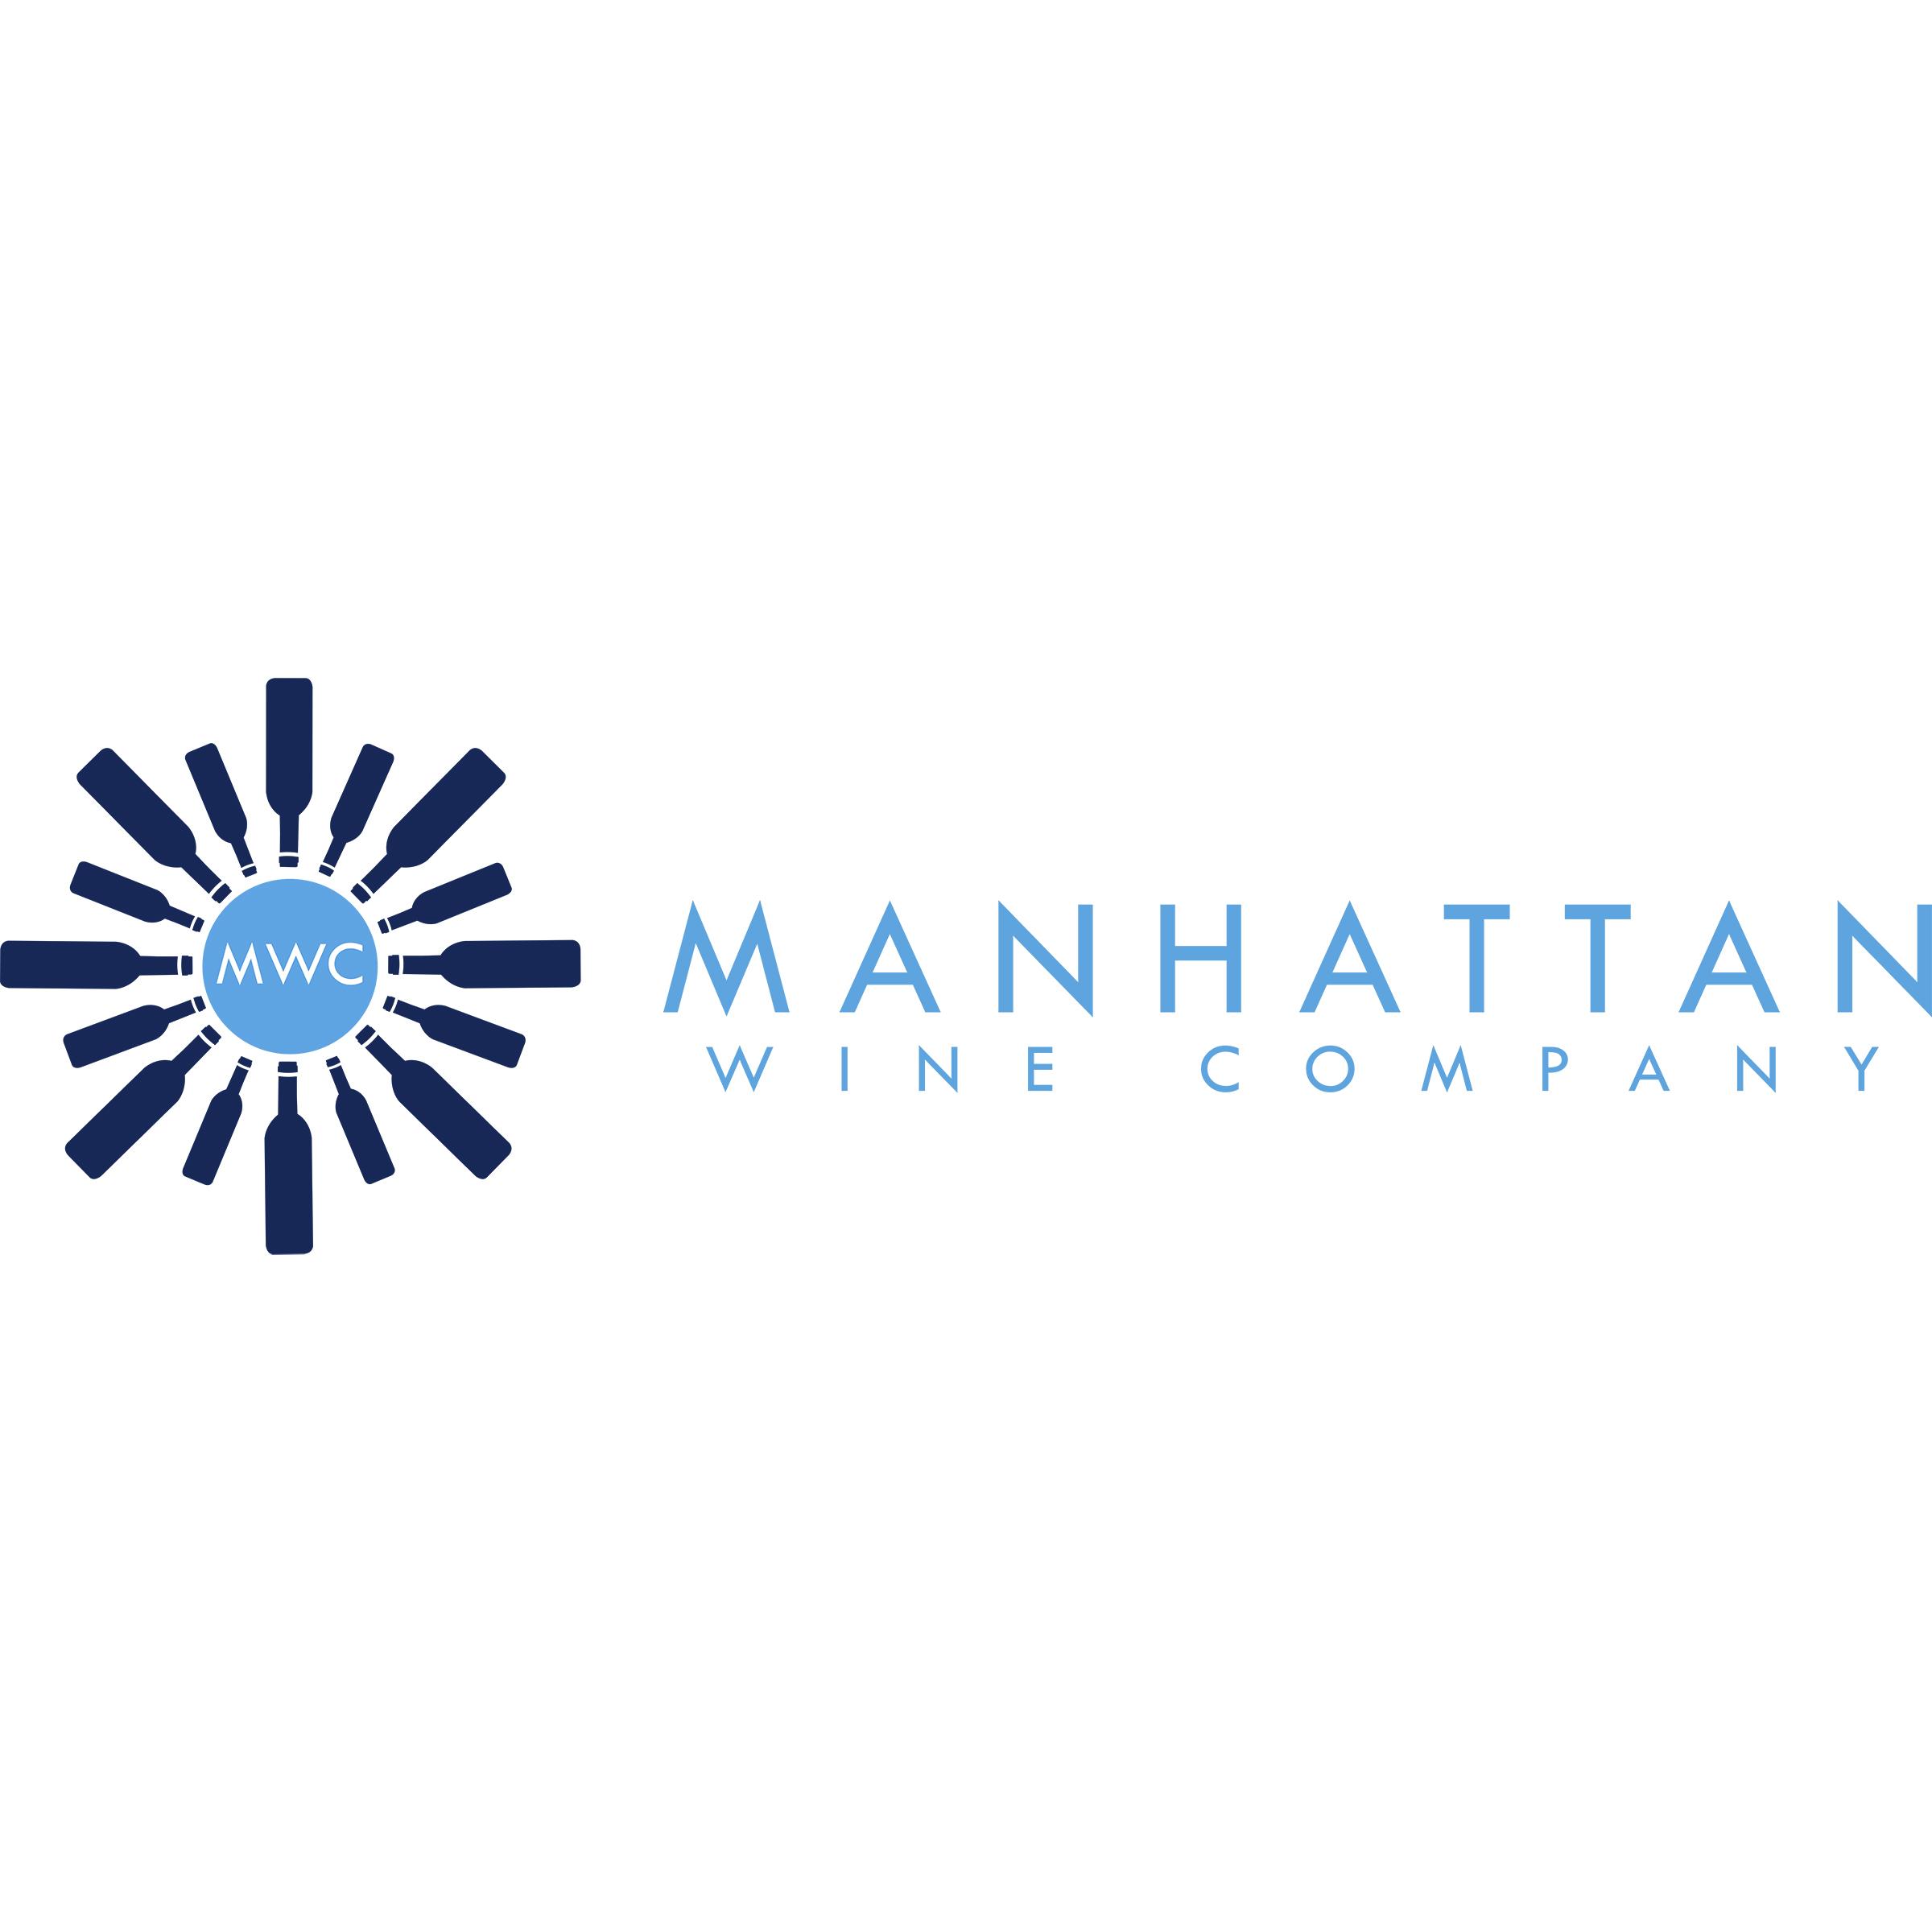 Manhattan Wine Company